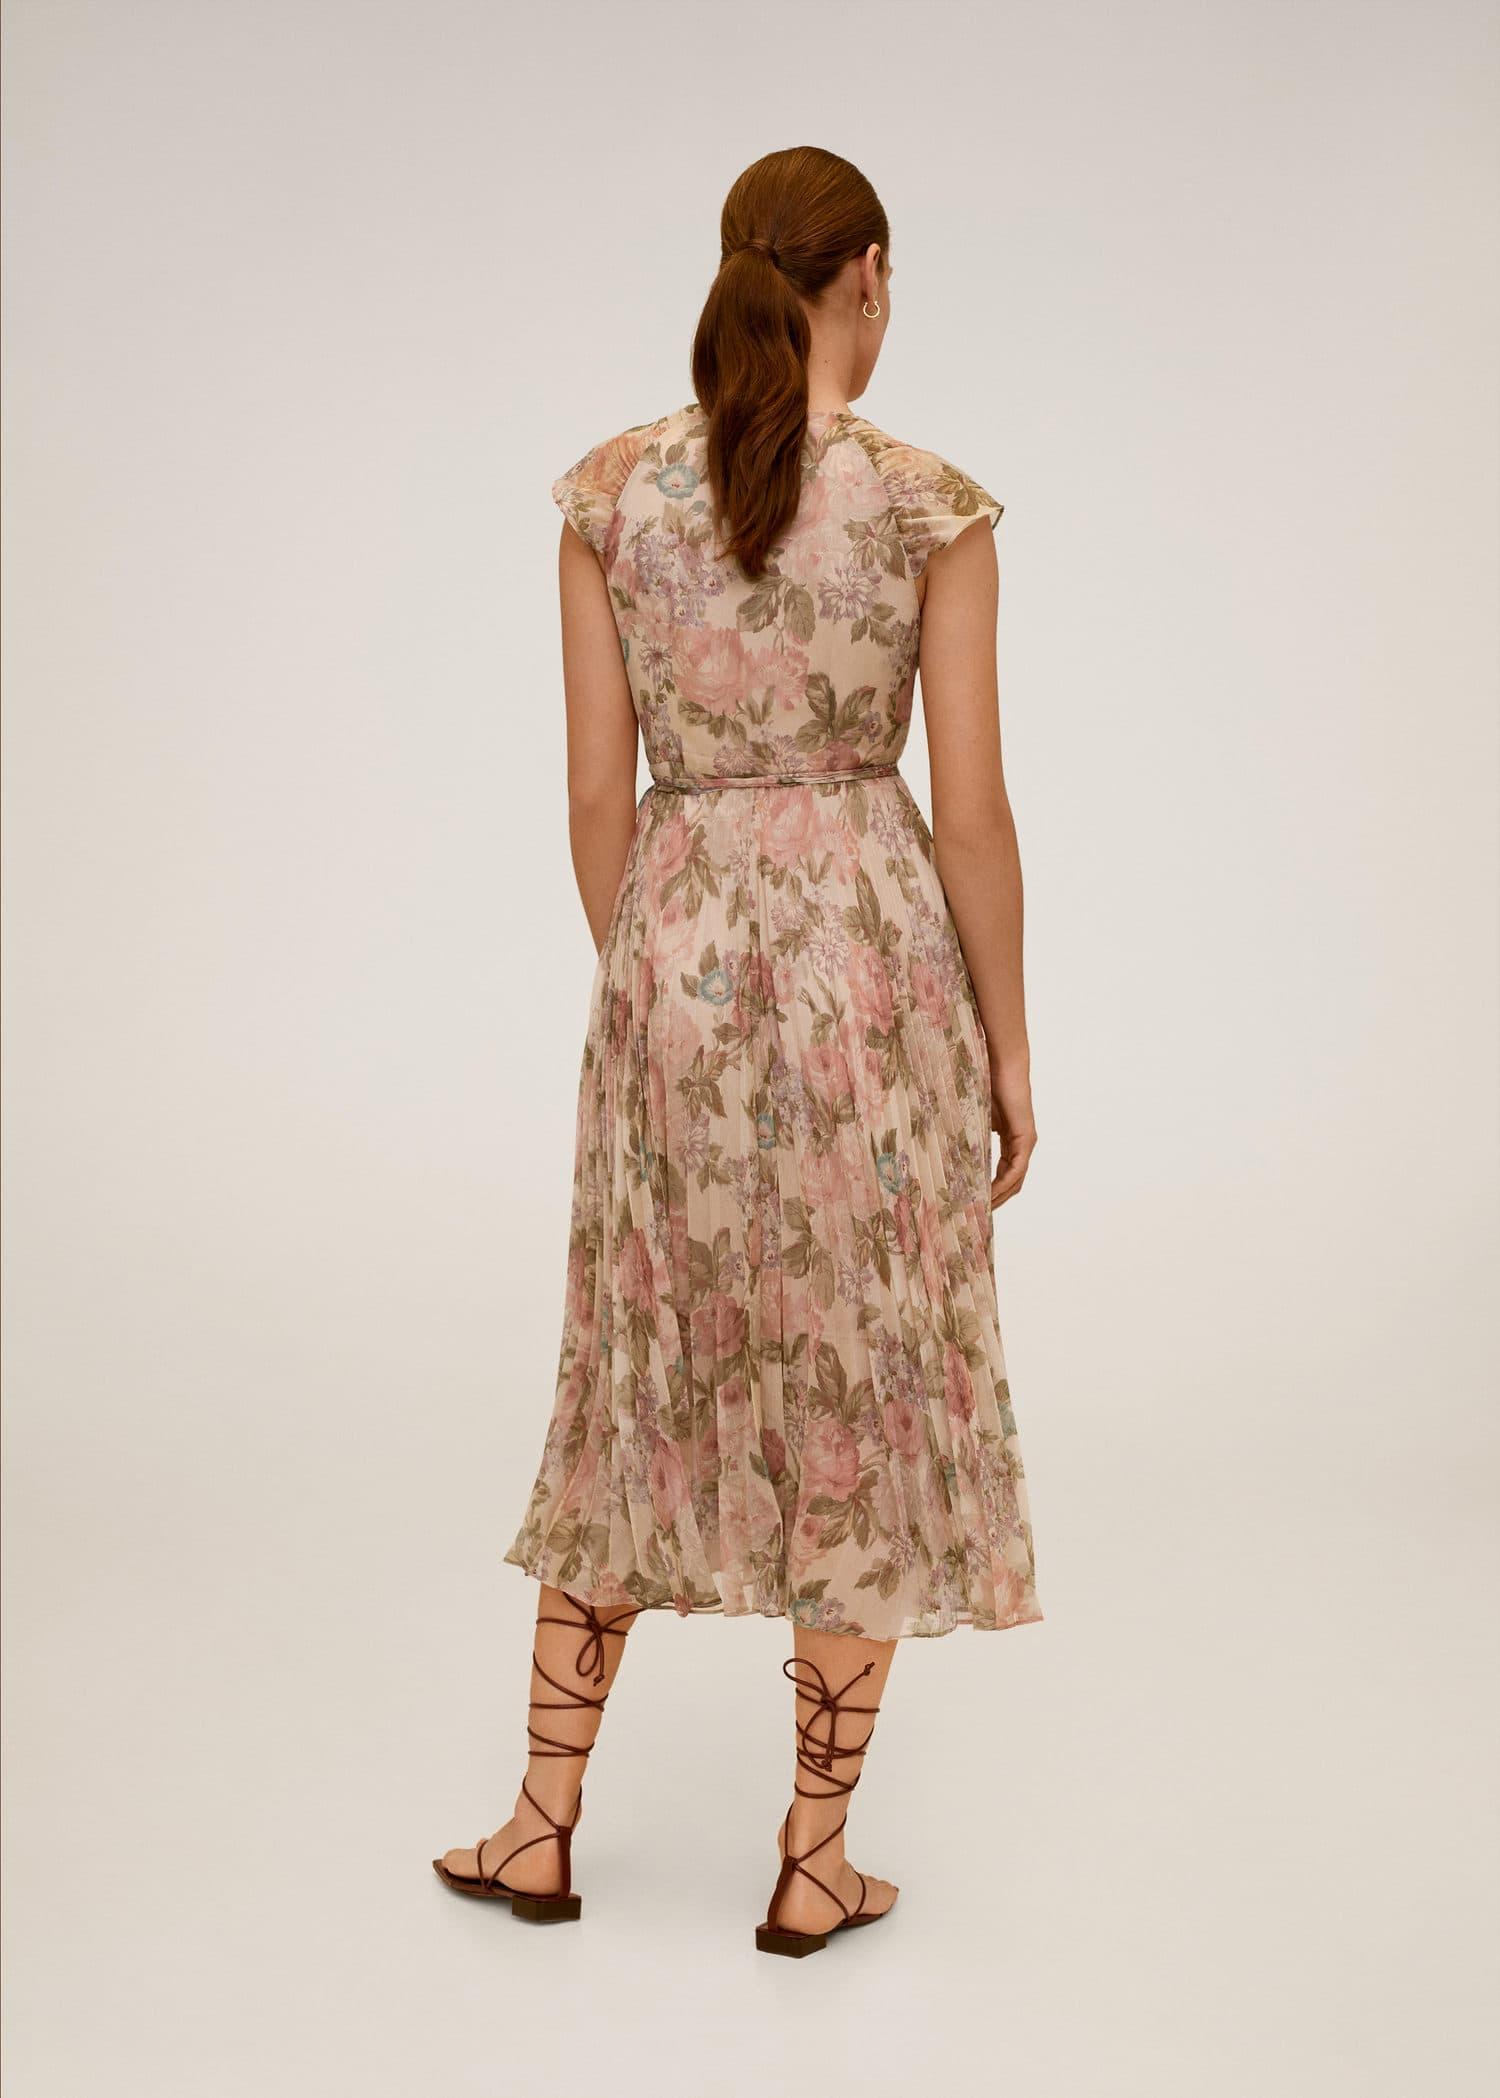 Kleid IN WEAR Wickel Optik schwarz natur beige Gr M L